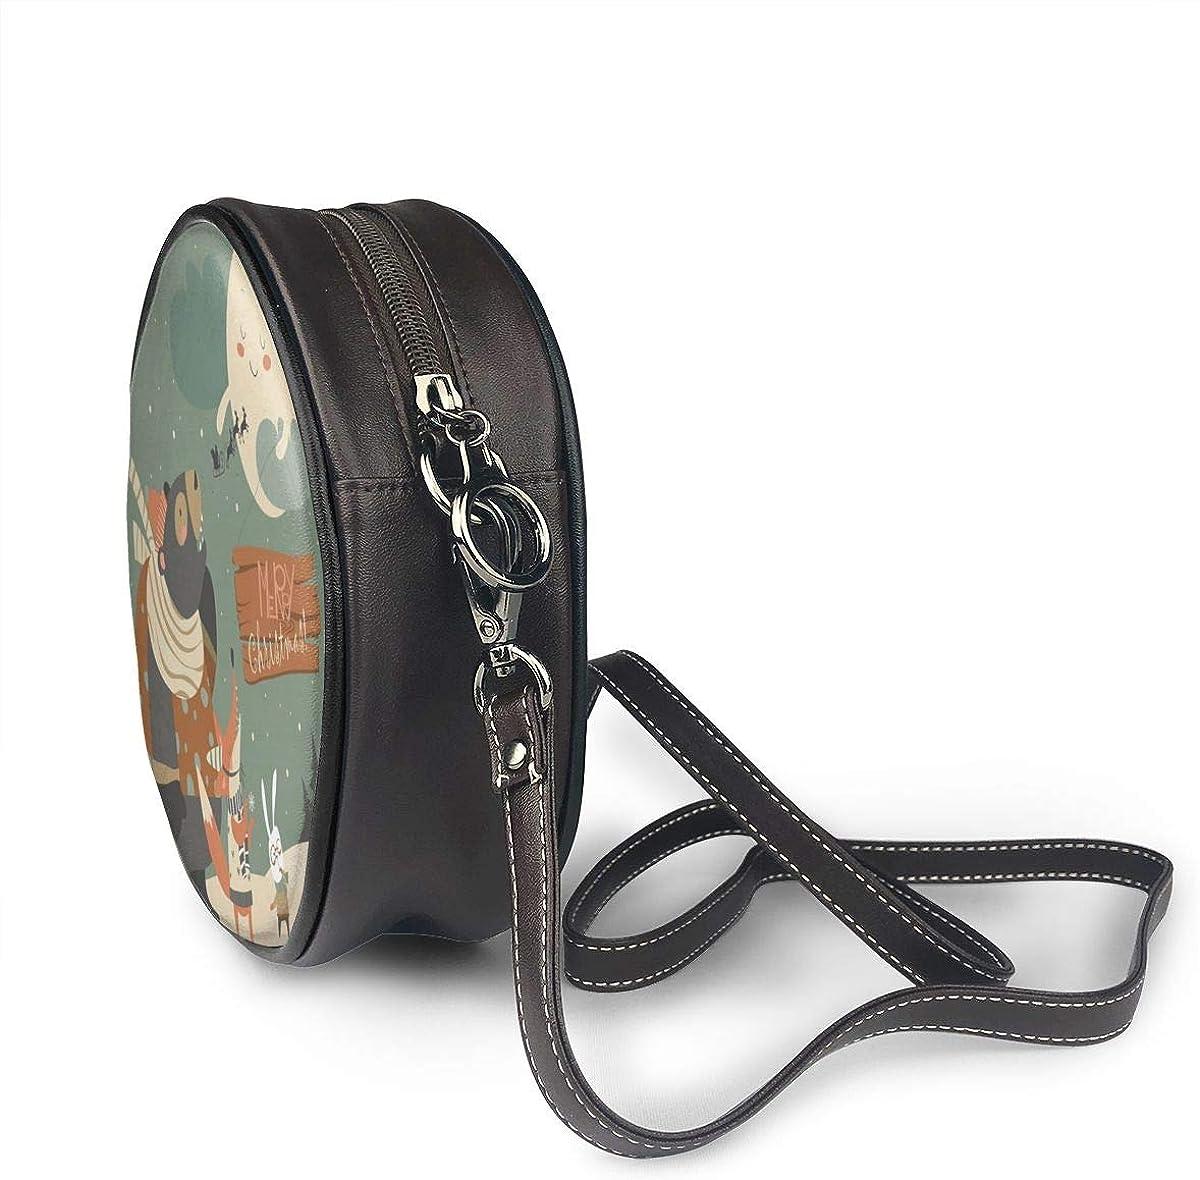 Christmas Bear Fox Moon Round Leather Shoulder Bag Fashion Lady Crossbody Wallet Adjustable Top Handbag For Women Girl